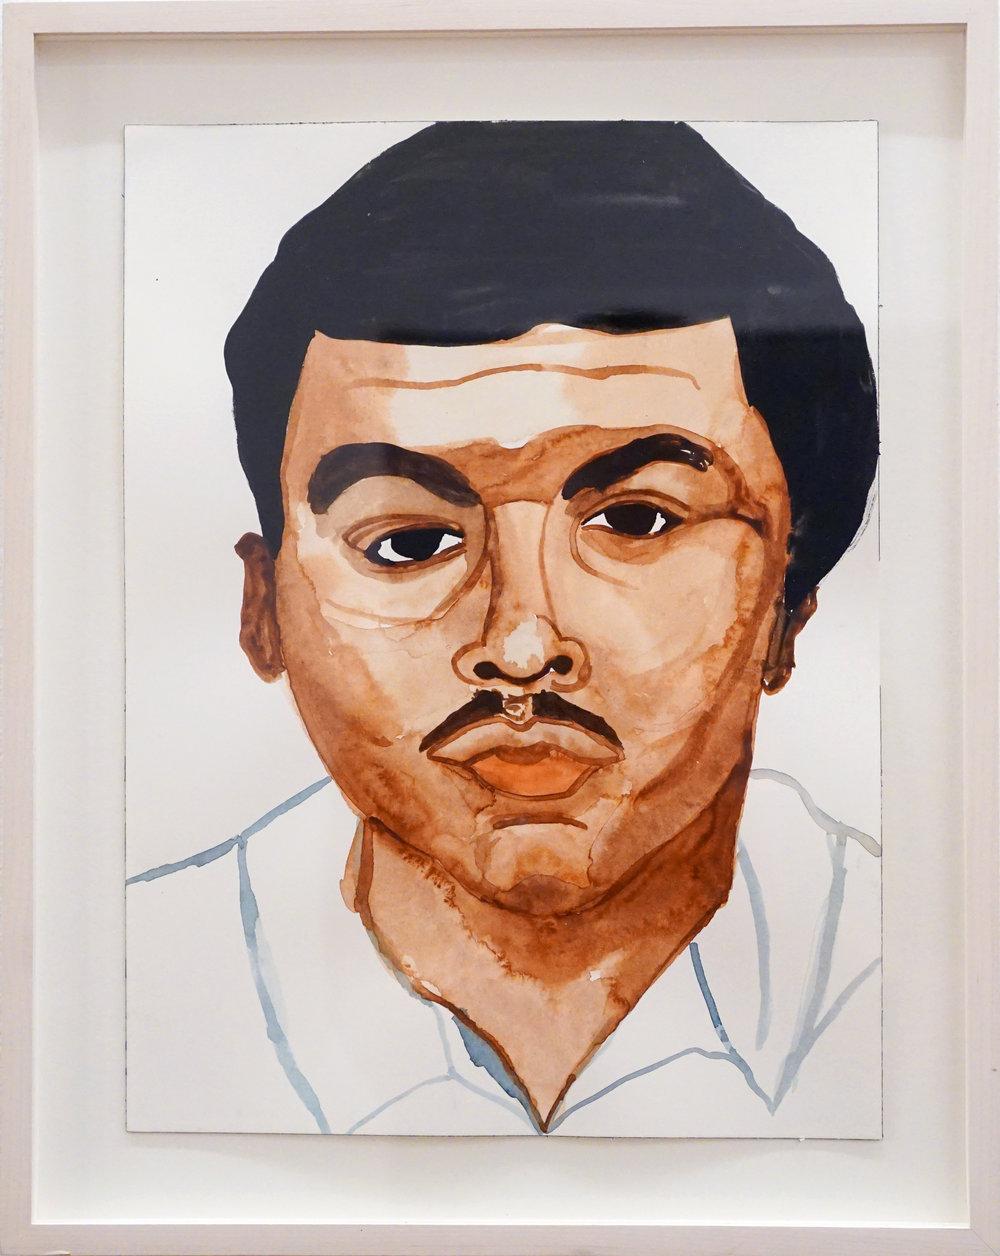 Rudy Shepherd, Sean Bell , 2006, Framed watercolor on paper, Framed dimensions: 15 x 12 in